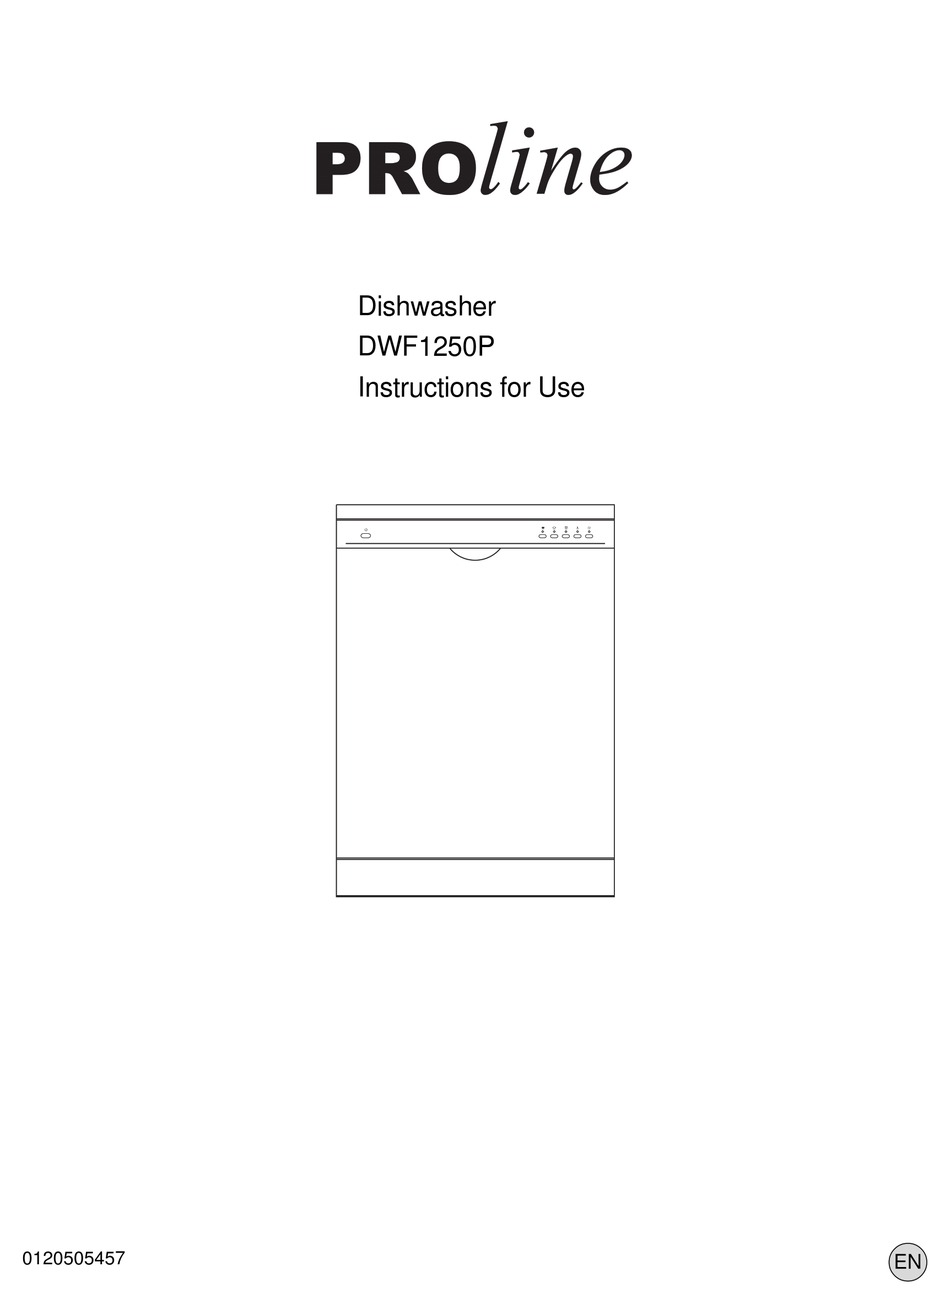 Proline Dwf1250p Instructions For Use Manual Pdf Download Manualslib